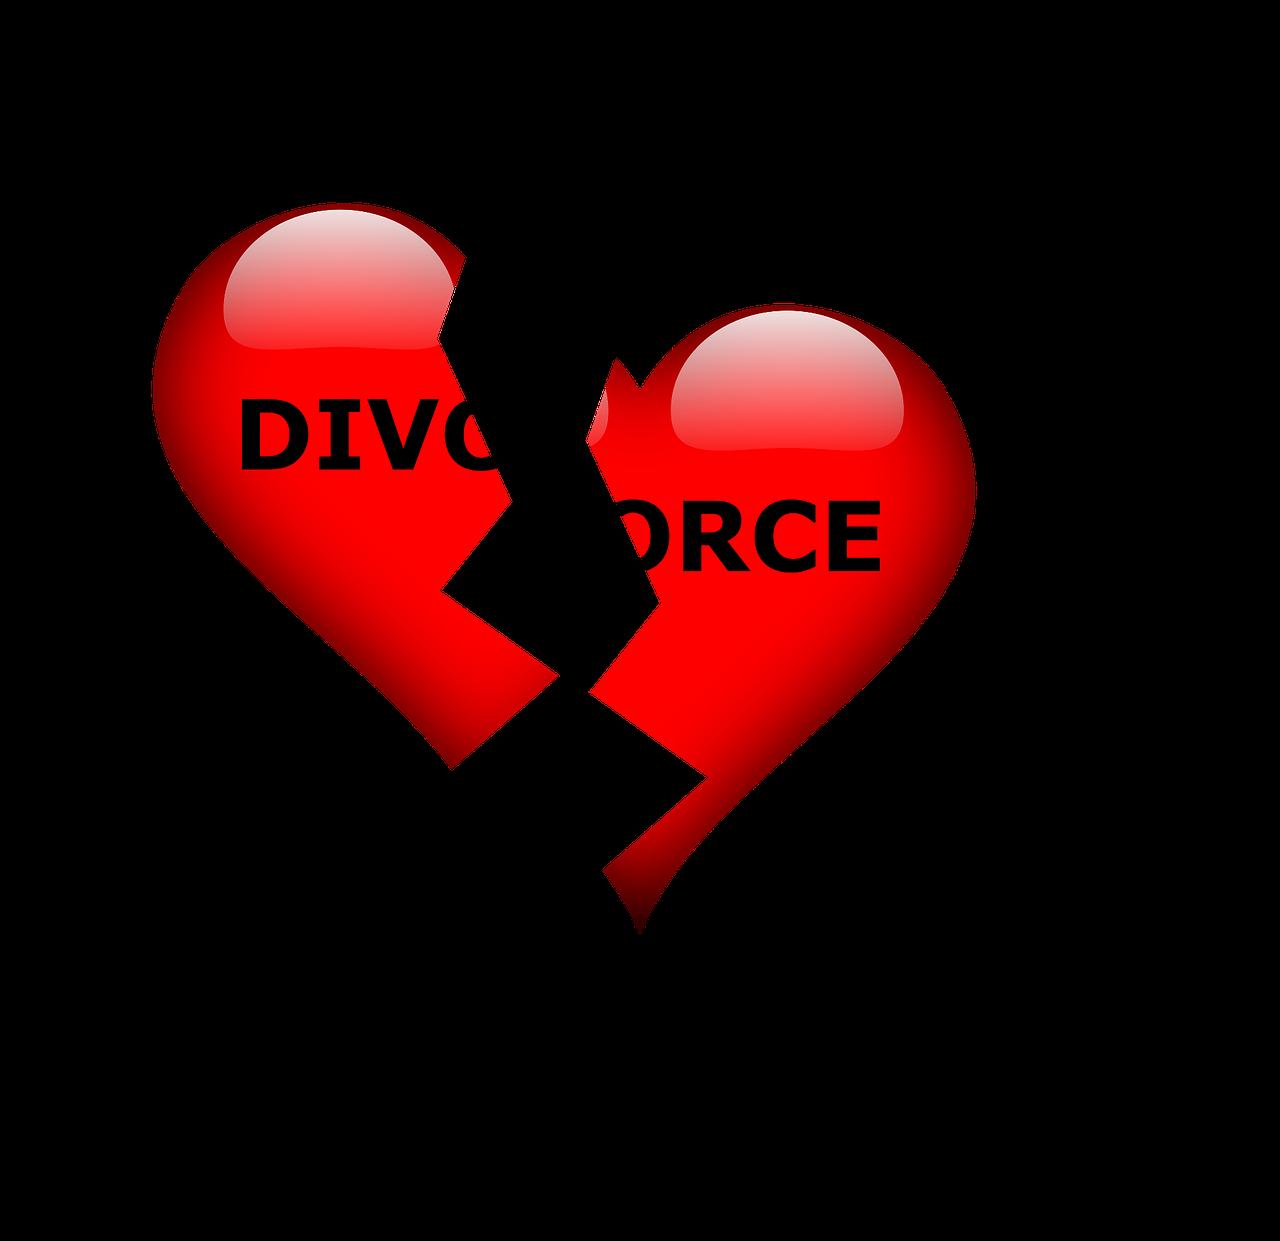 Divorce,break up,separation,split,marriage - free image from ...